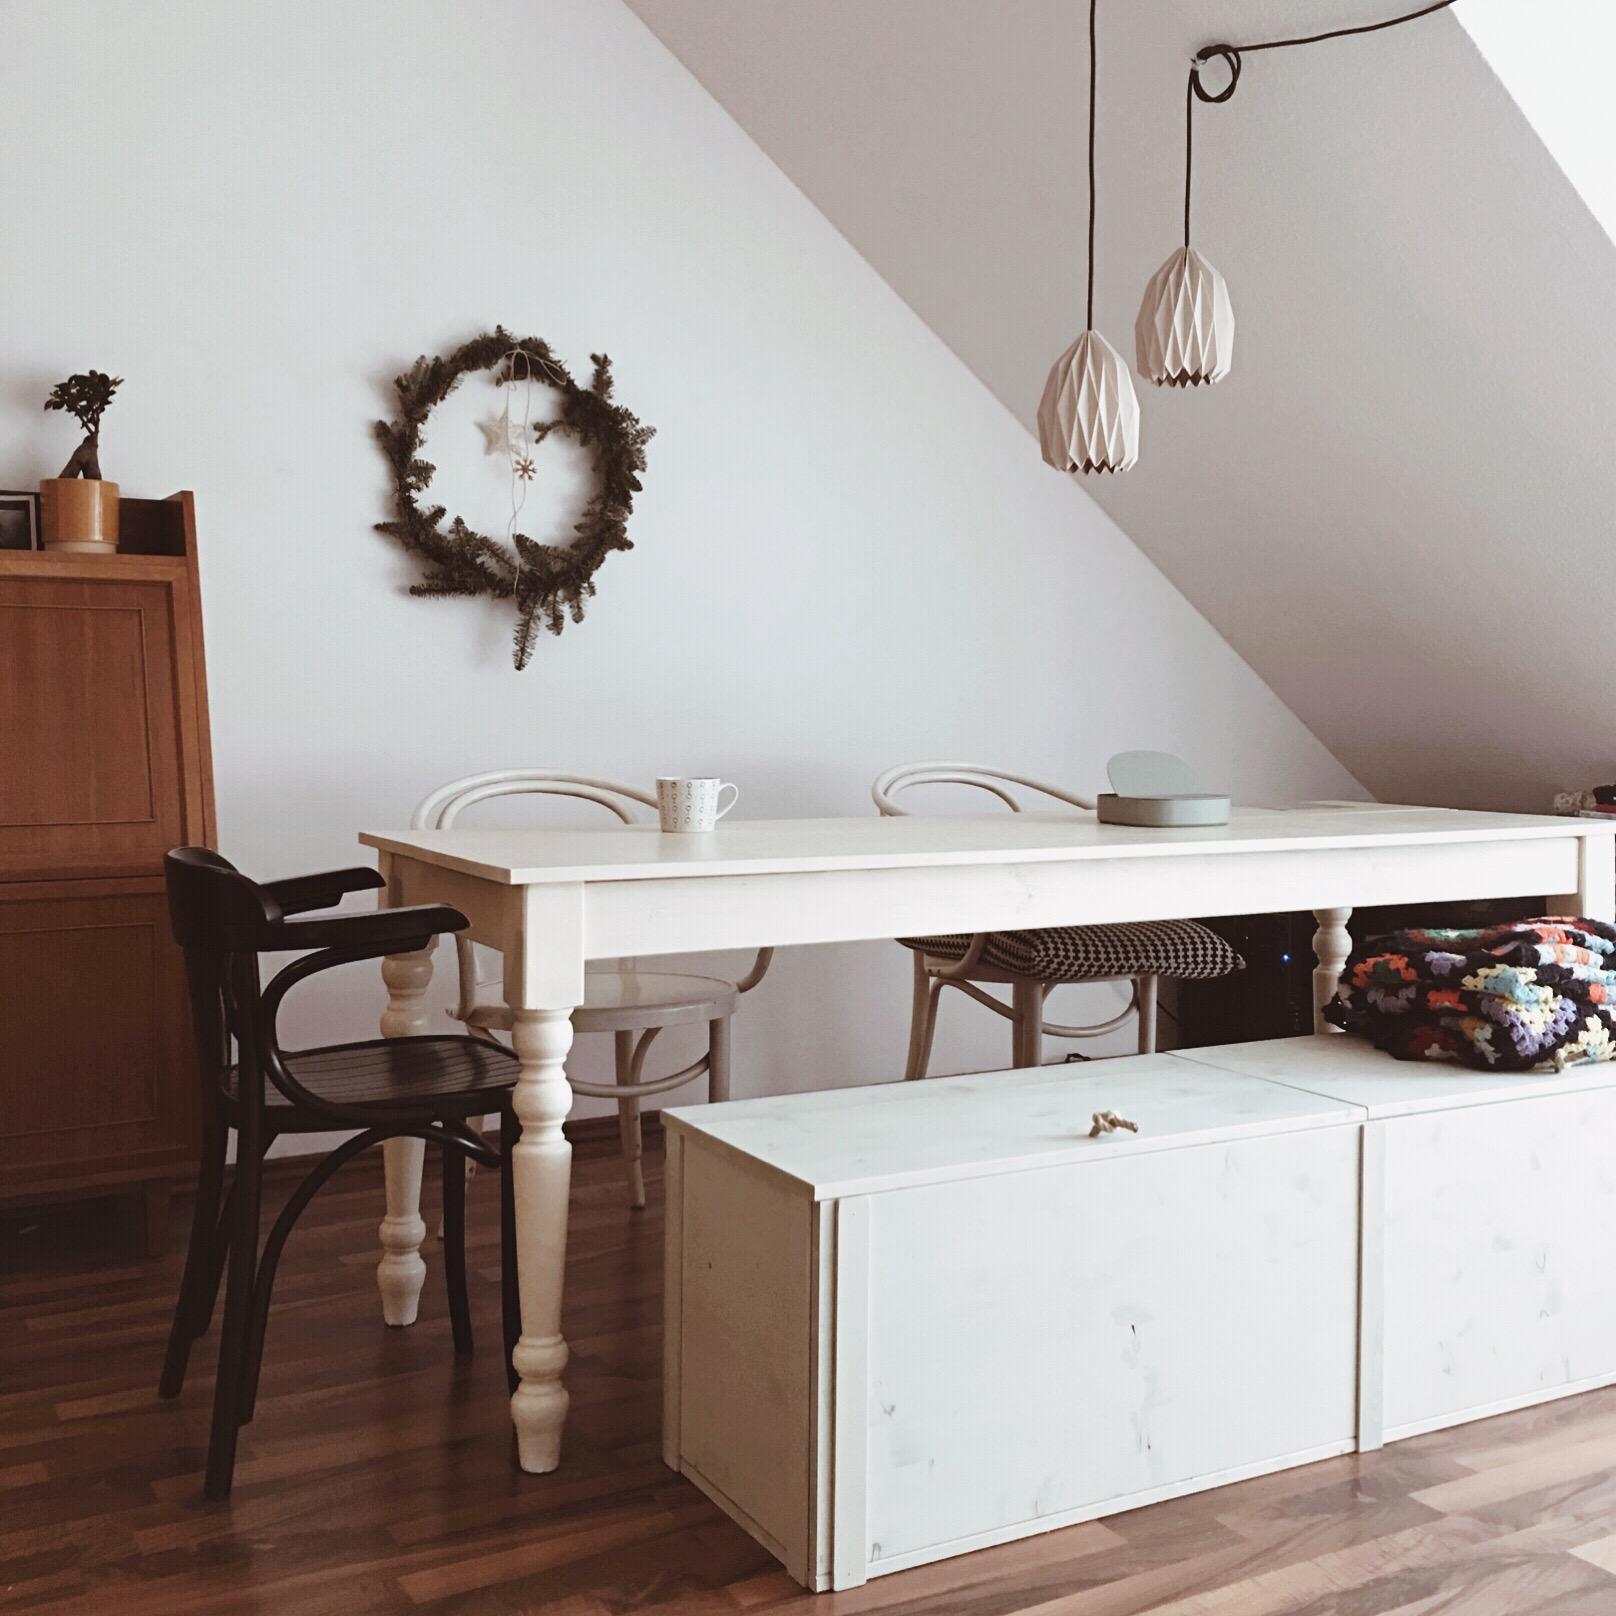 Sitztruhe Badezimmer, sitztruhe tchibo, Design ideen